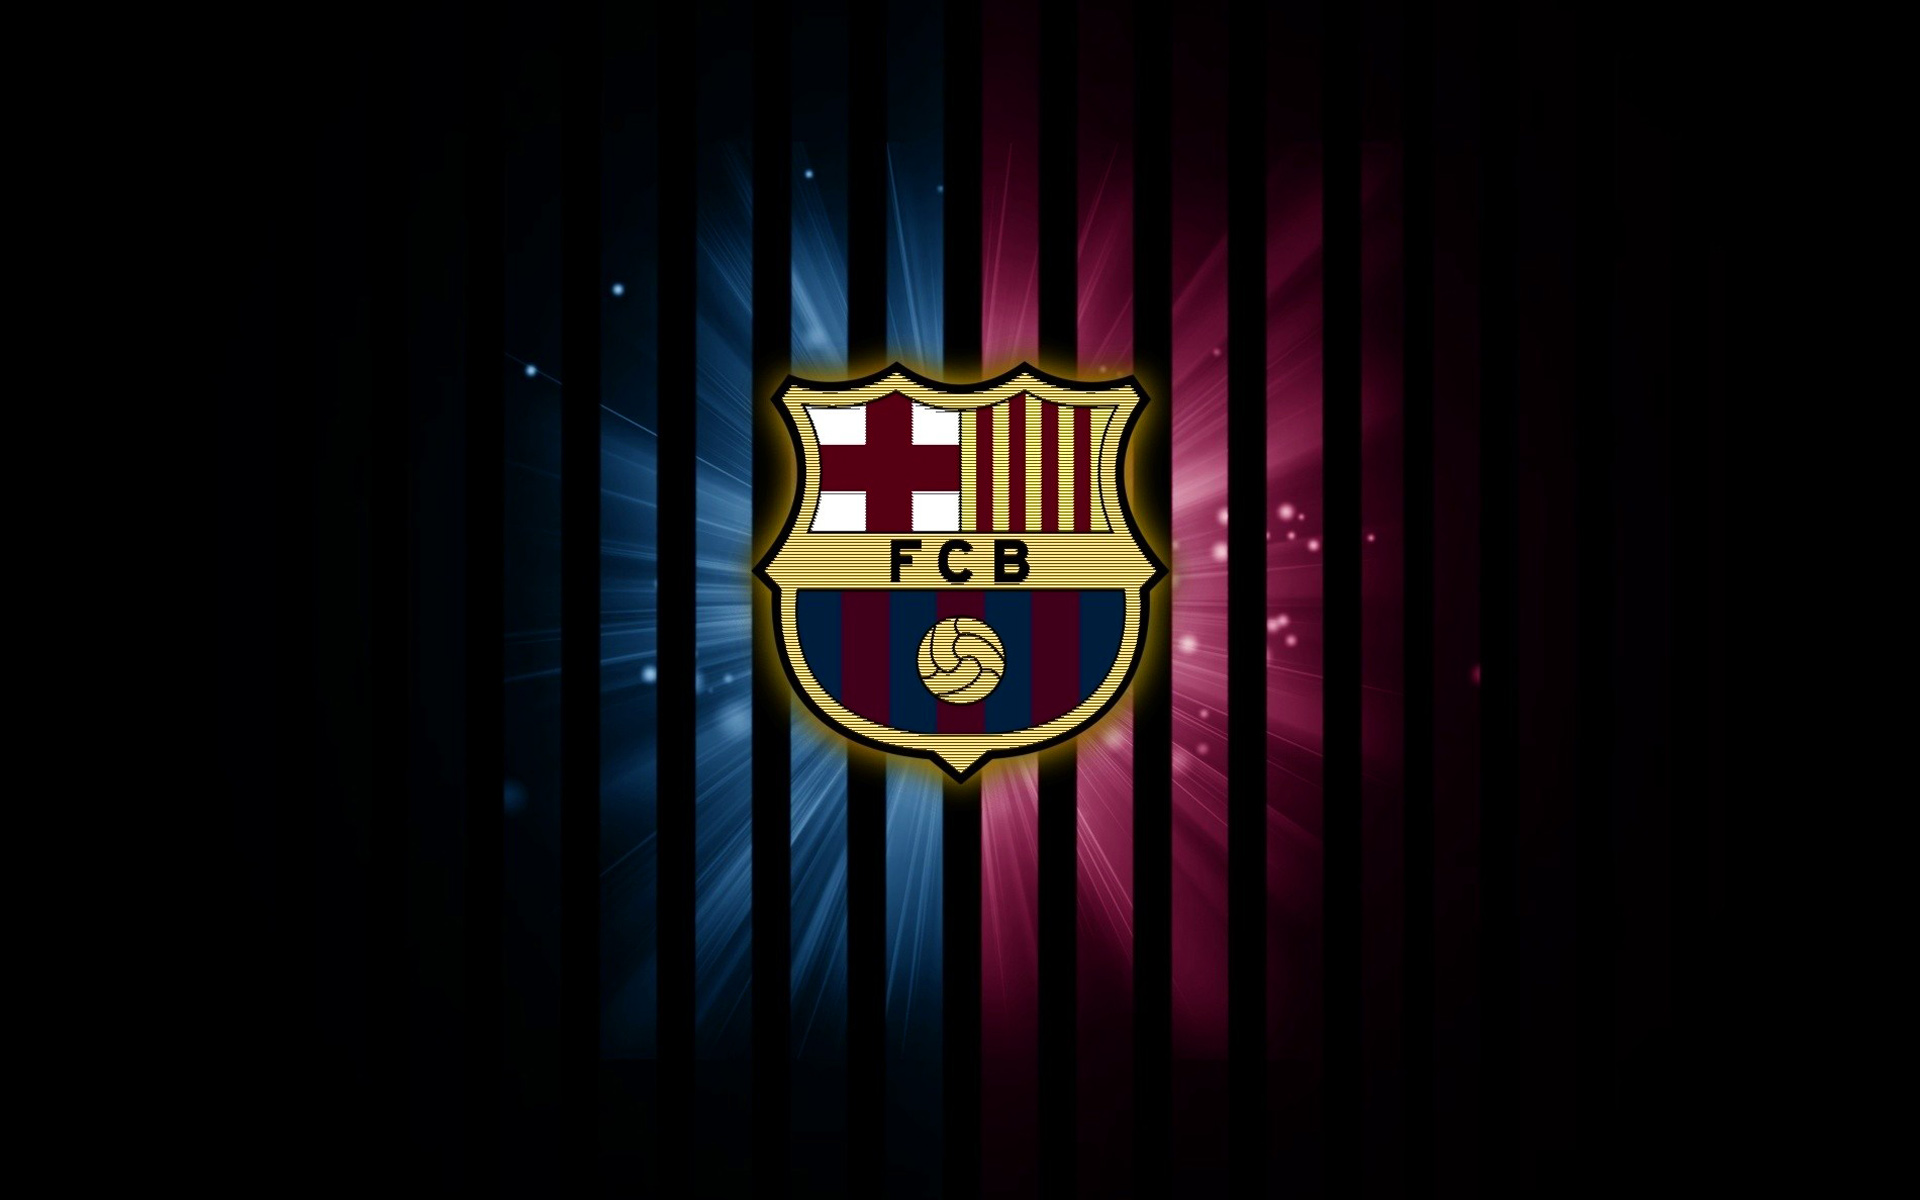 بالصور صور شعار برشلونة , اجمل صور لشعار نادى برشلونه 5547 13